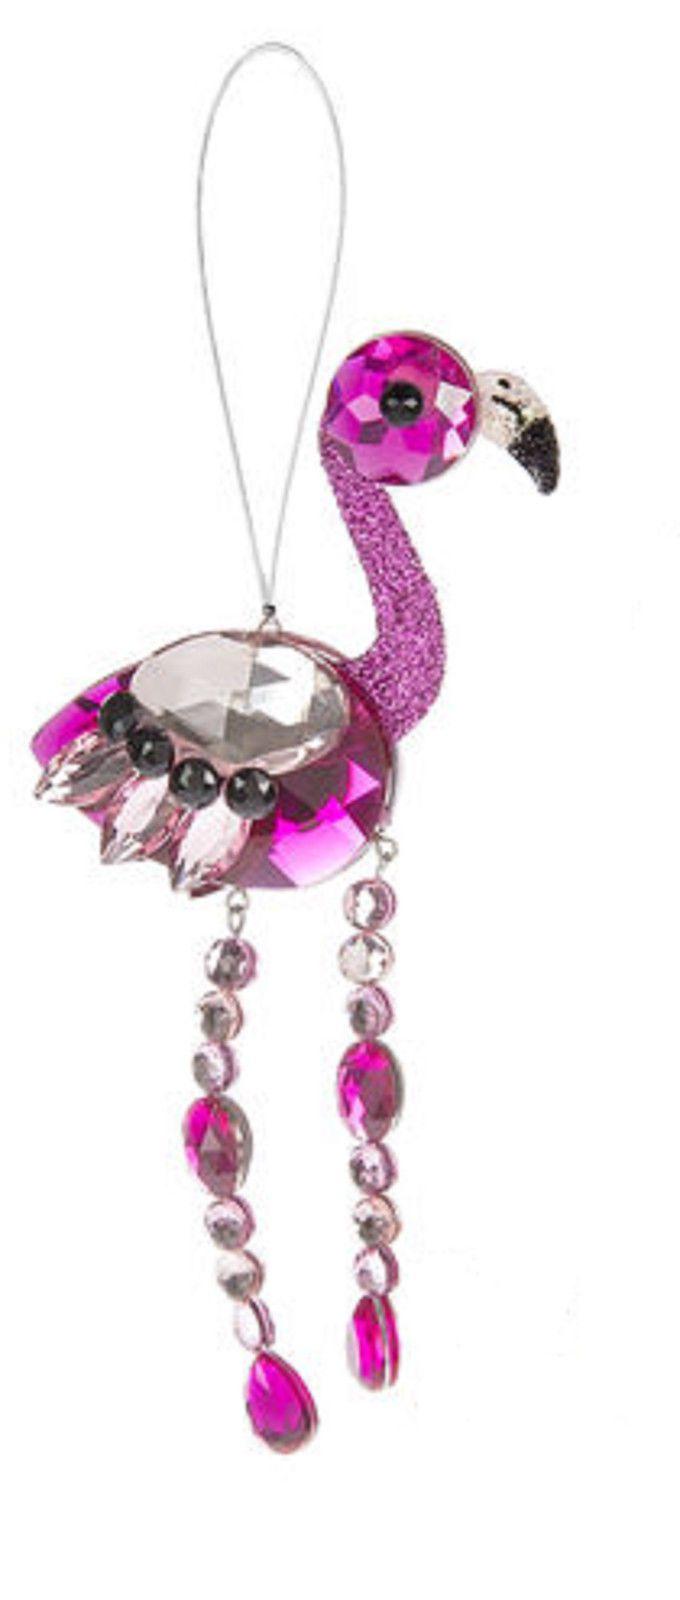 Pink Flamingo SUNCATCHER Ganz Crystal Expressions w Suction Cup Holder | eBay